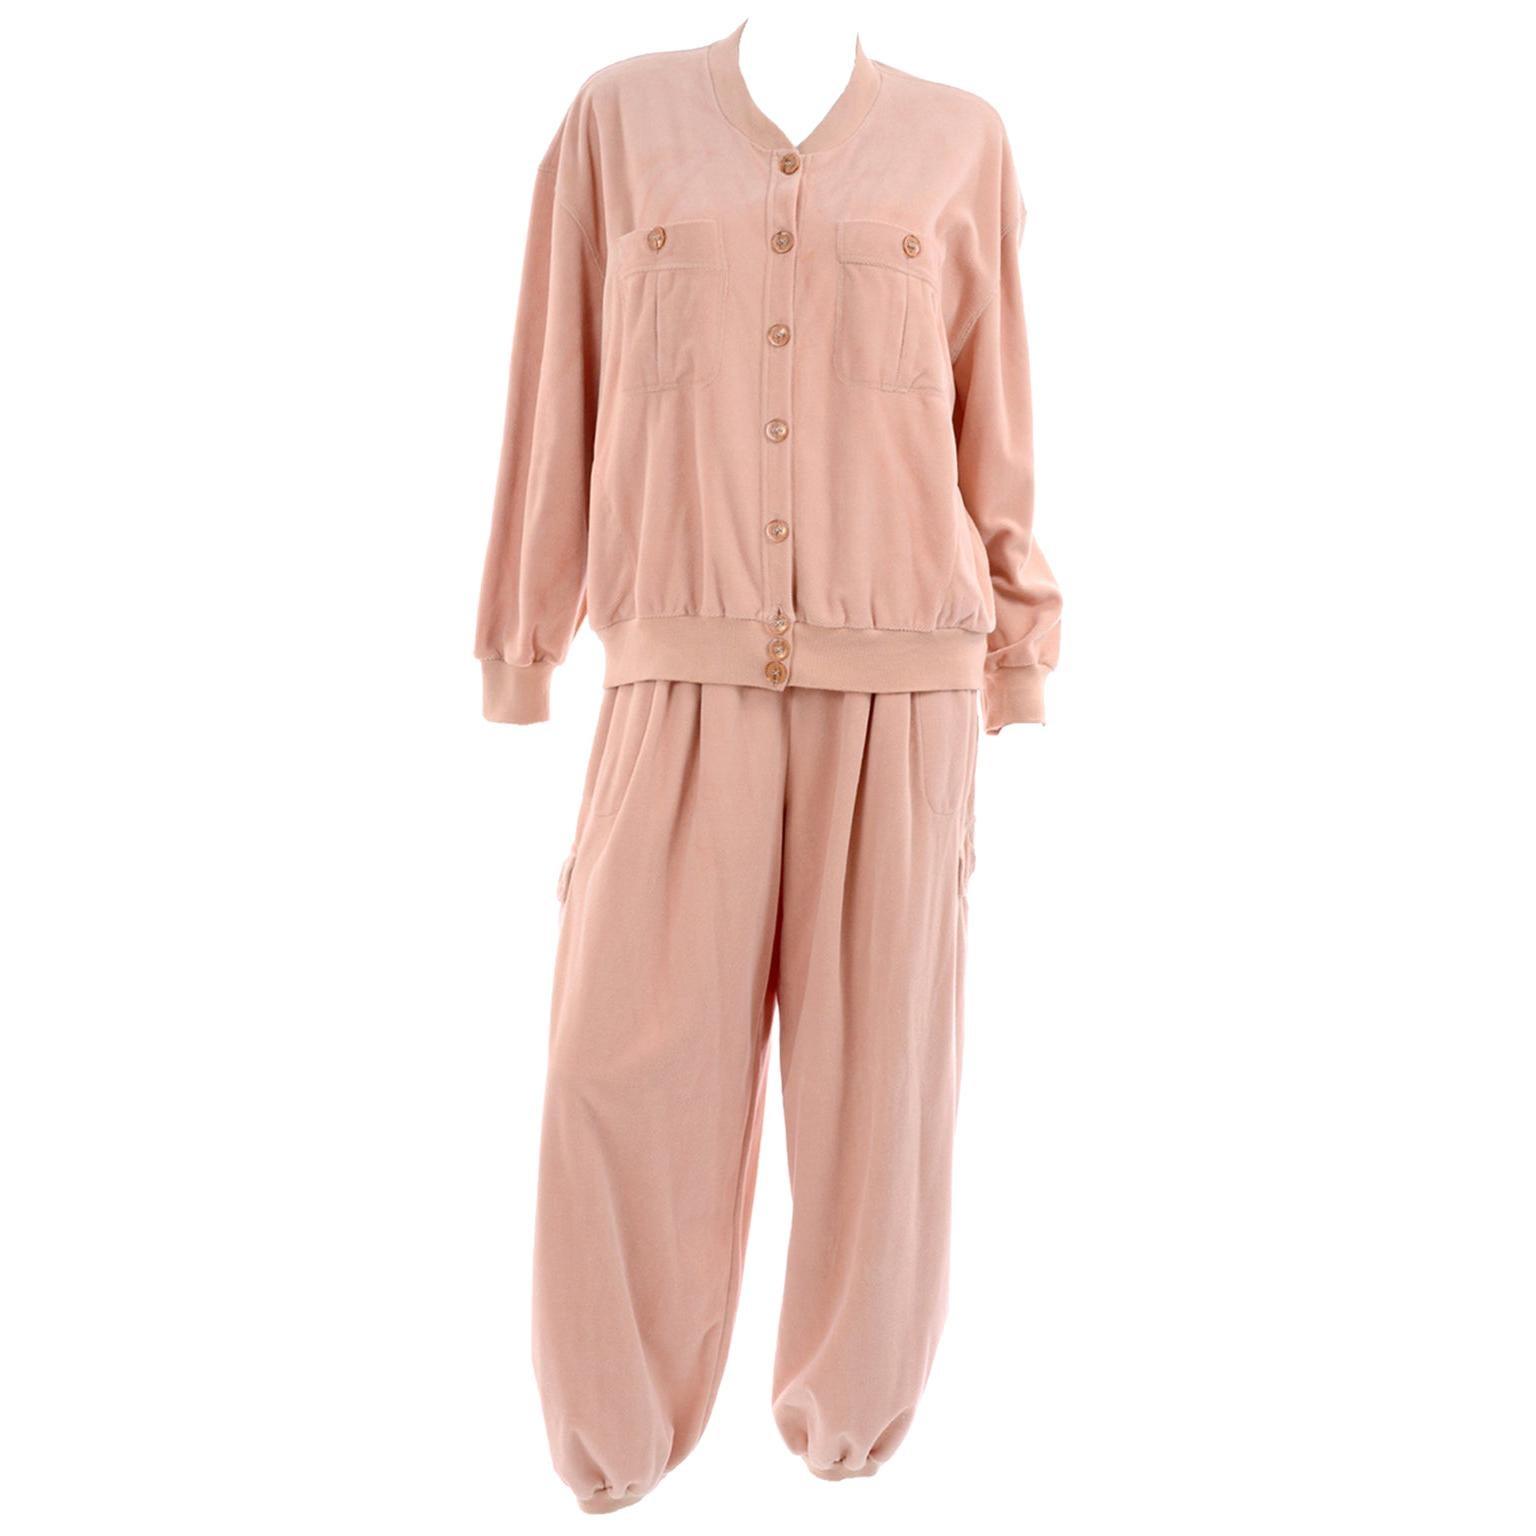 Sonia Rykiel Paris Vintage Peach Tracksuit Cozy Athleisure Outfit W Pants & Top